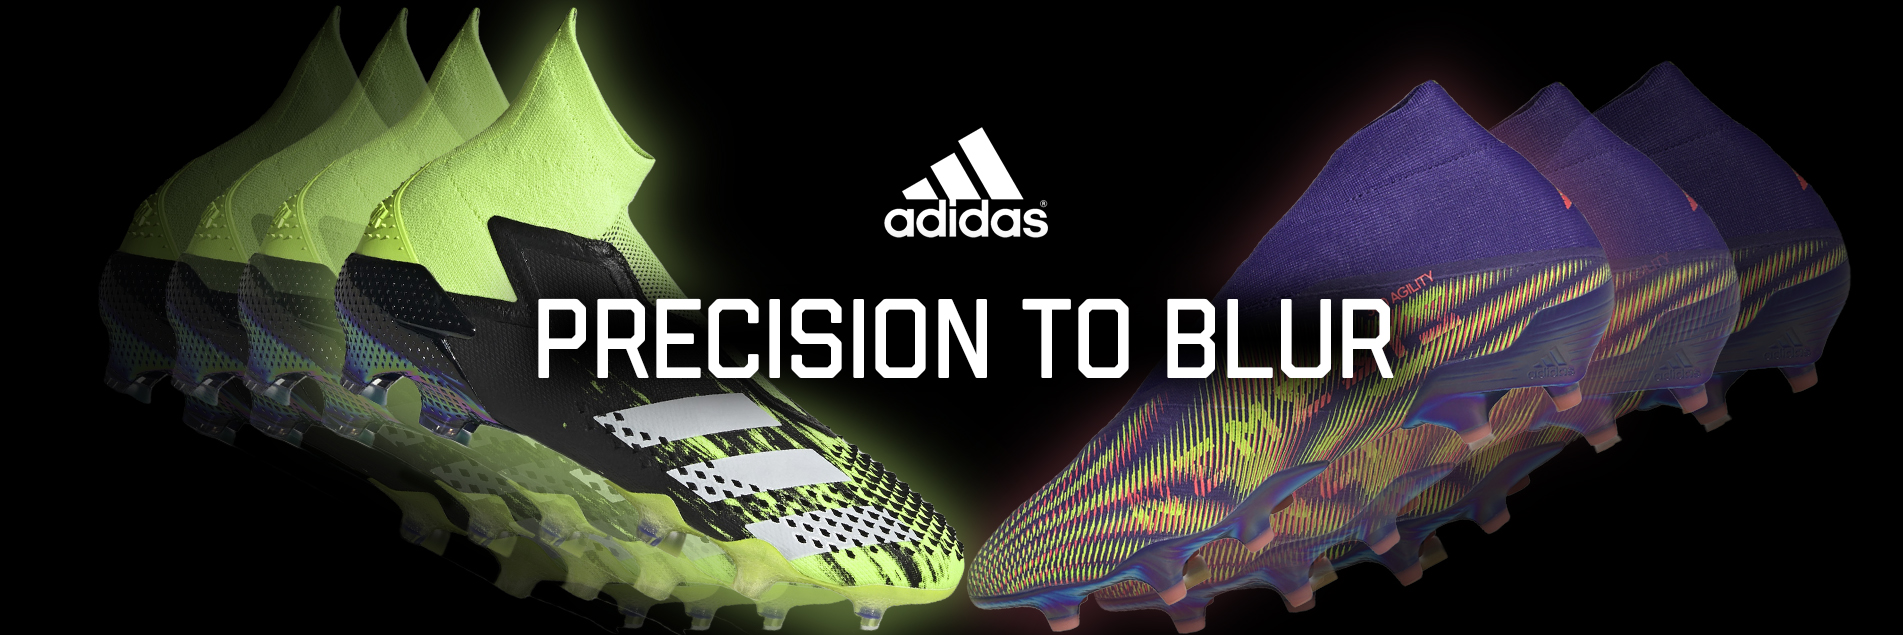 adidas Precision to Blur